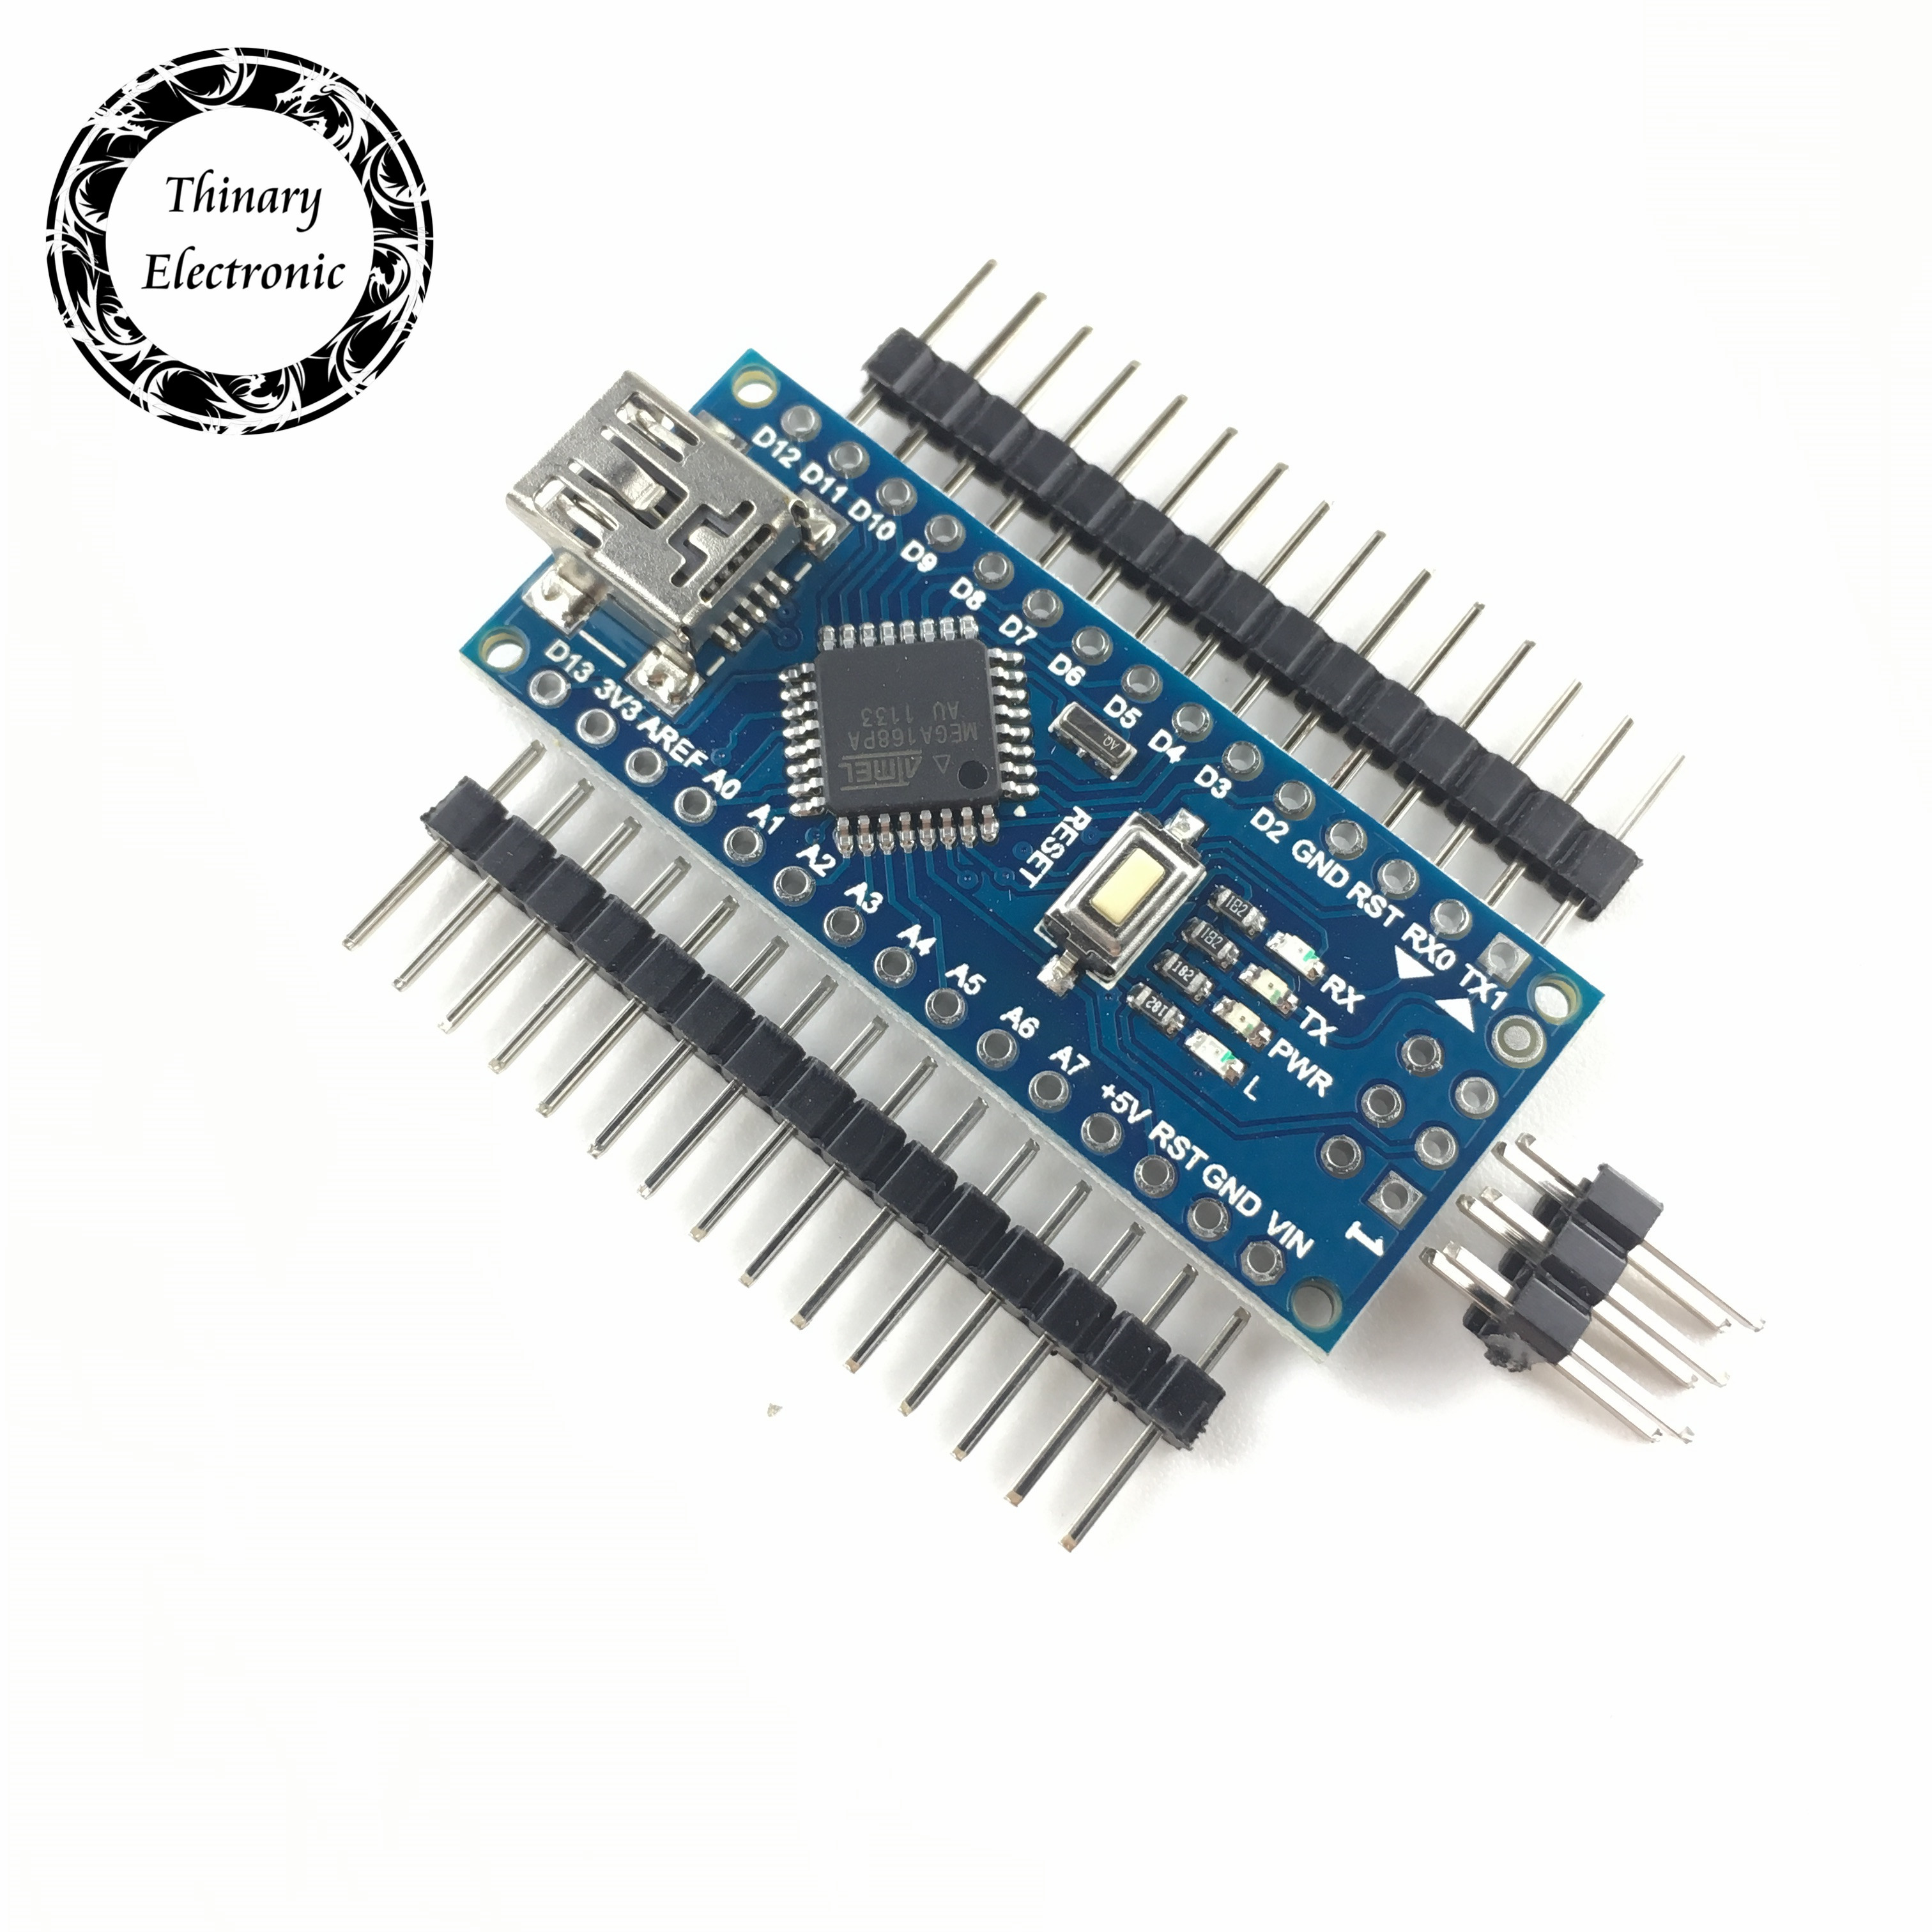 Thinary Electronic 100Pcs lot Nano Atmega168 controller compatible for arduino nano Atmega168P CH340 CH340G USB driver